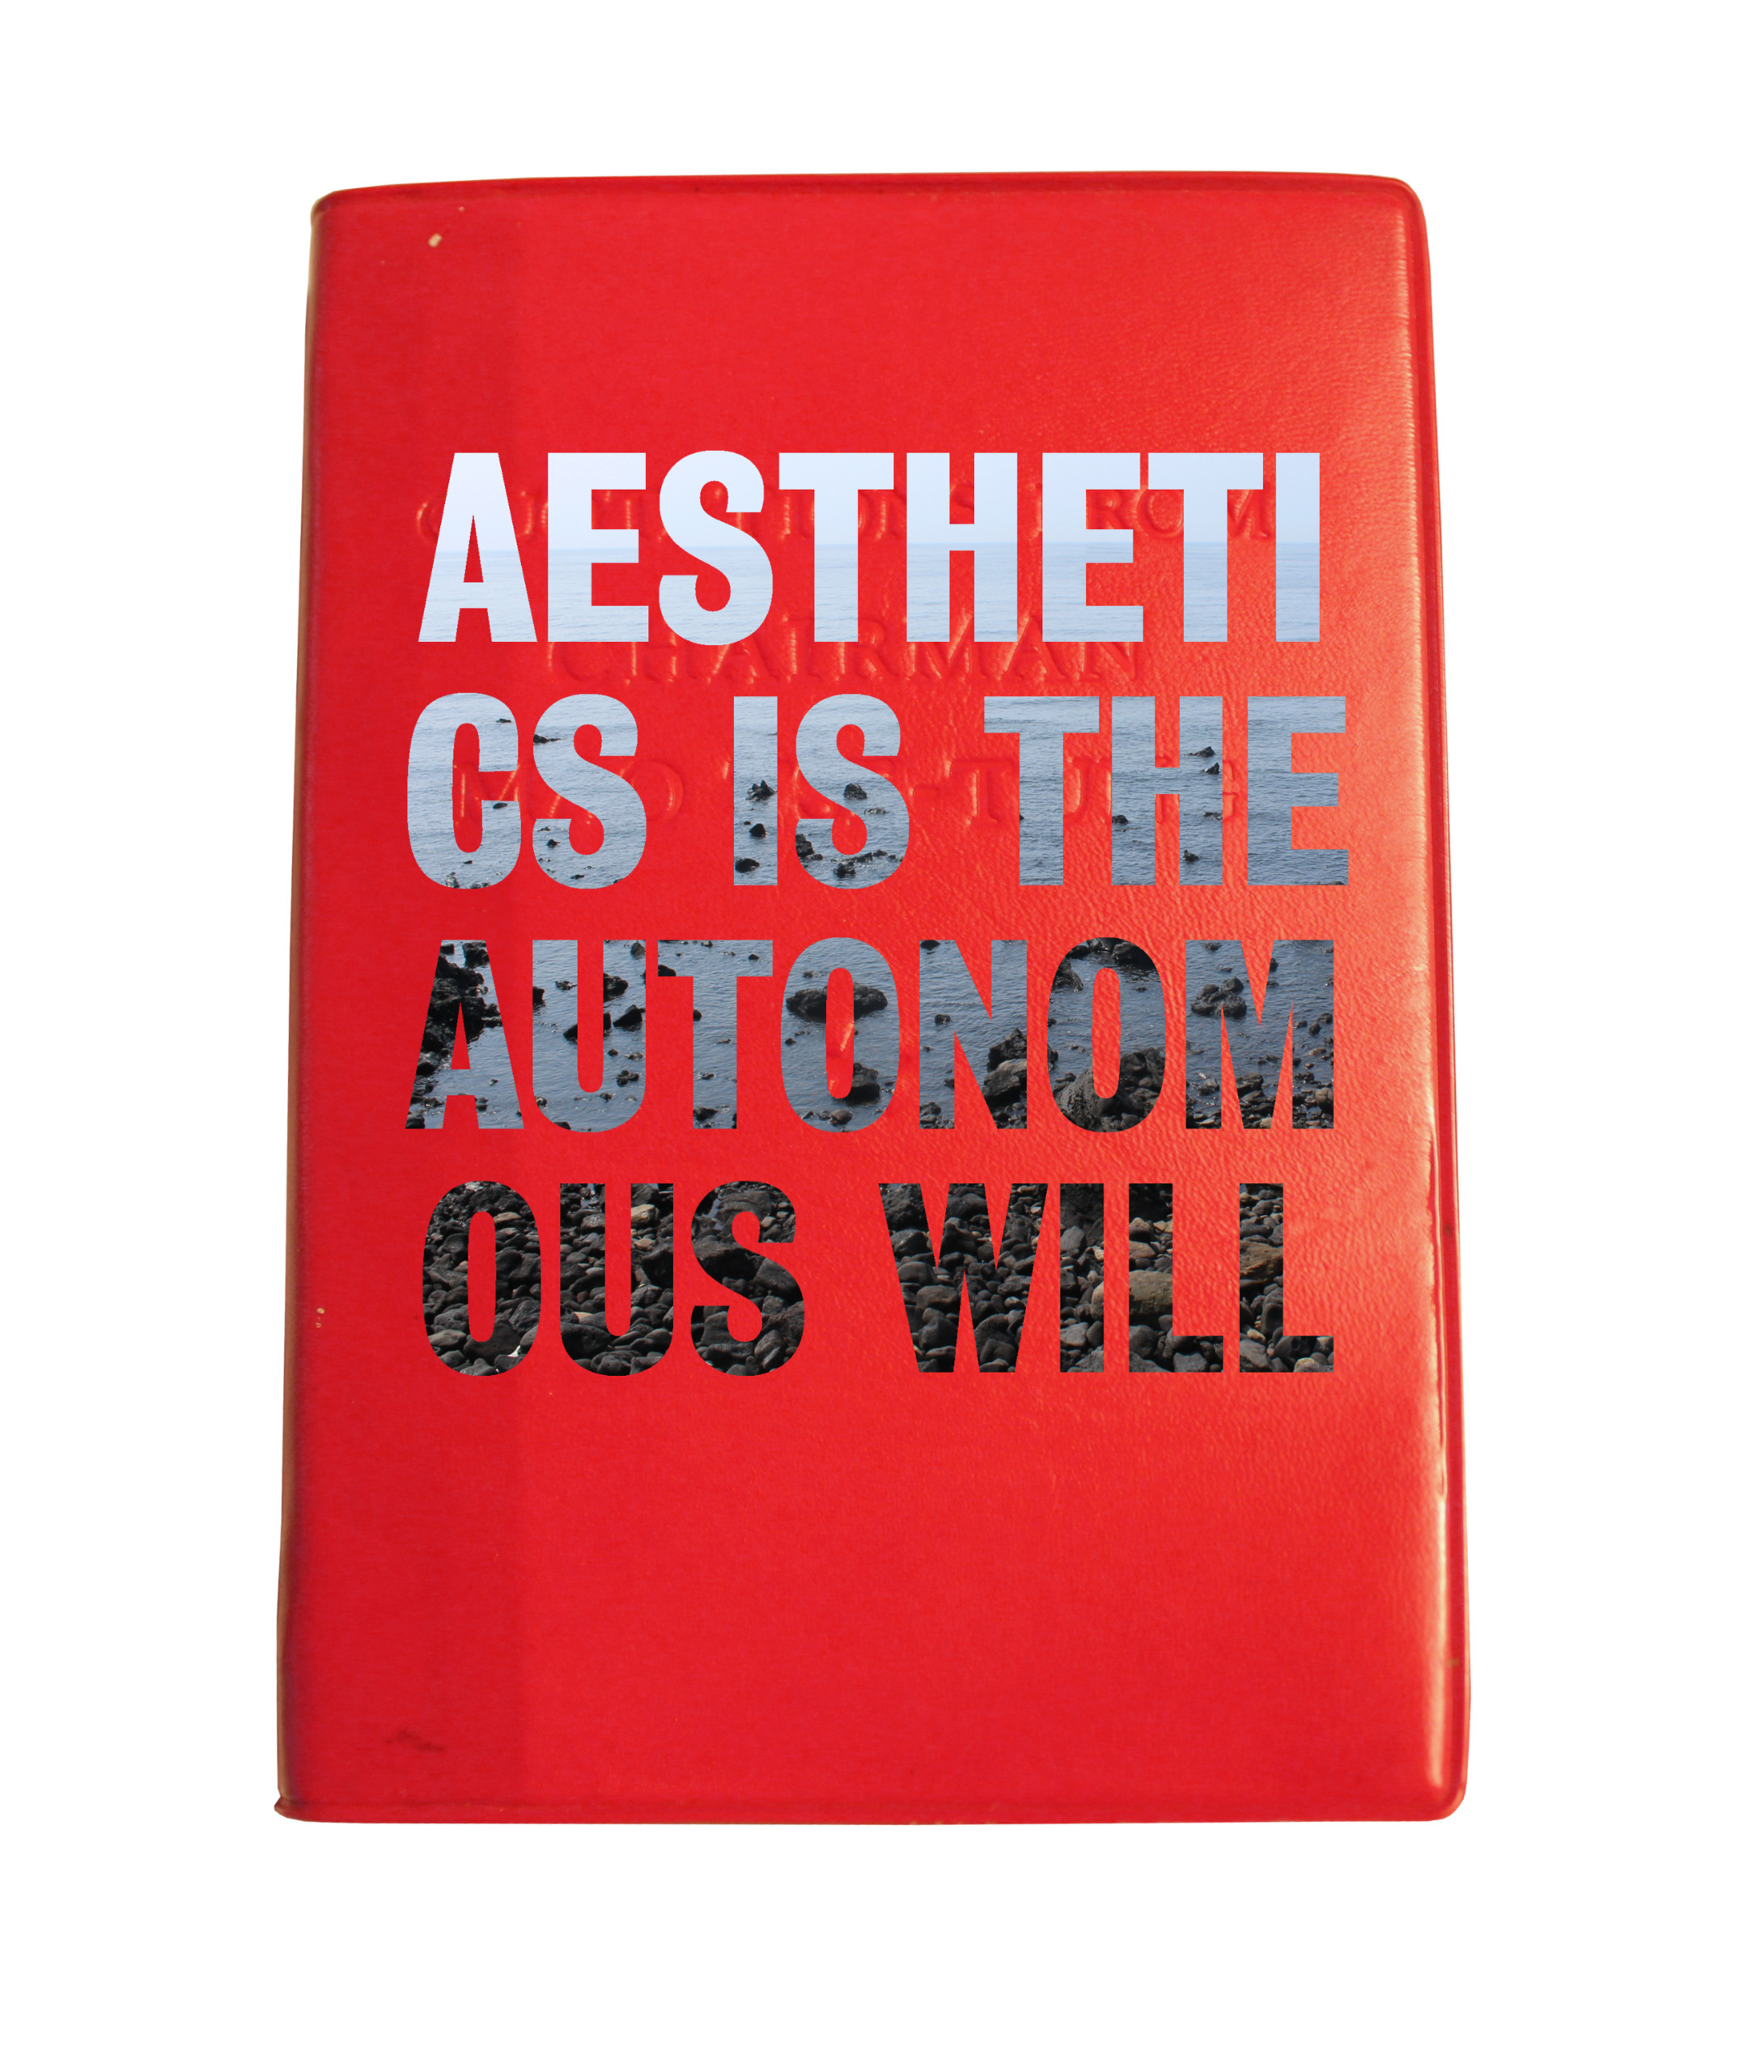 Aesthetics Autonomous 2 - illllllllllllli | ello